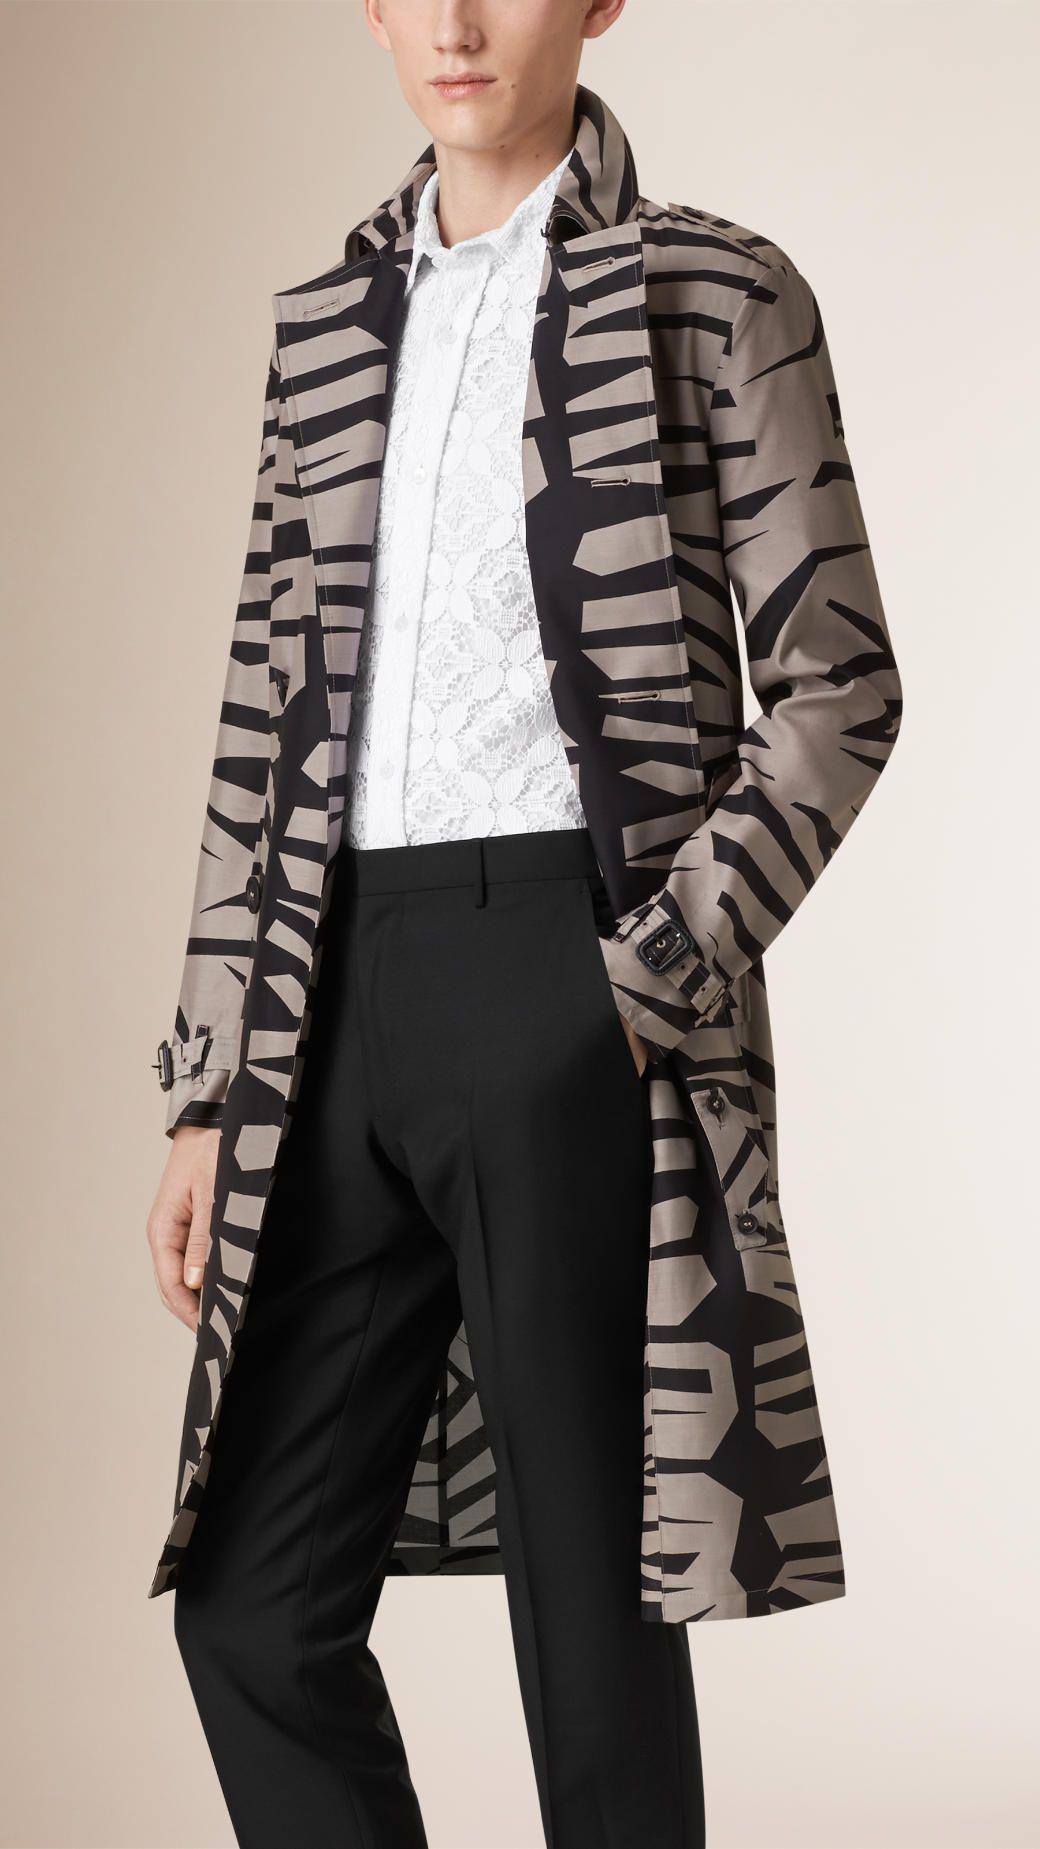 Burberry Sale Manteaux Ghoz5zn Pour Items Homme Coat On Pinterest xdBoCe